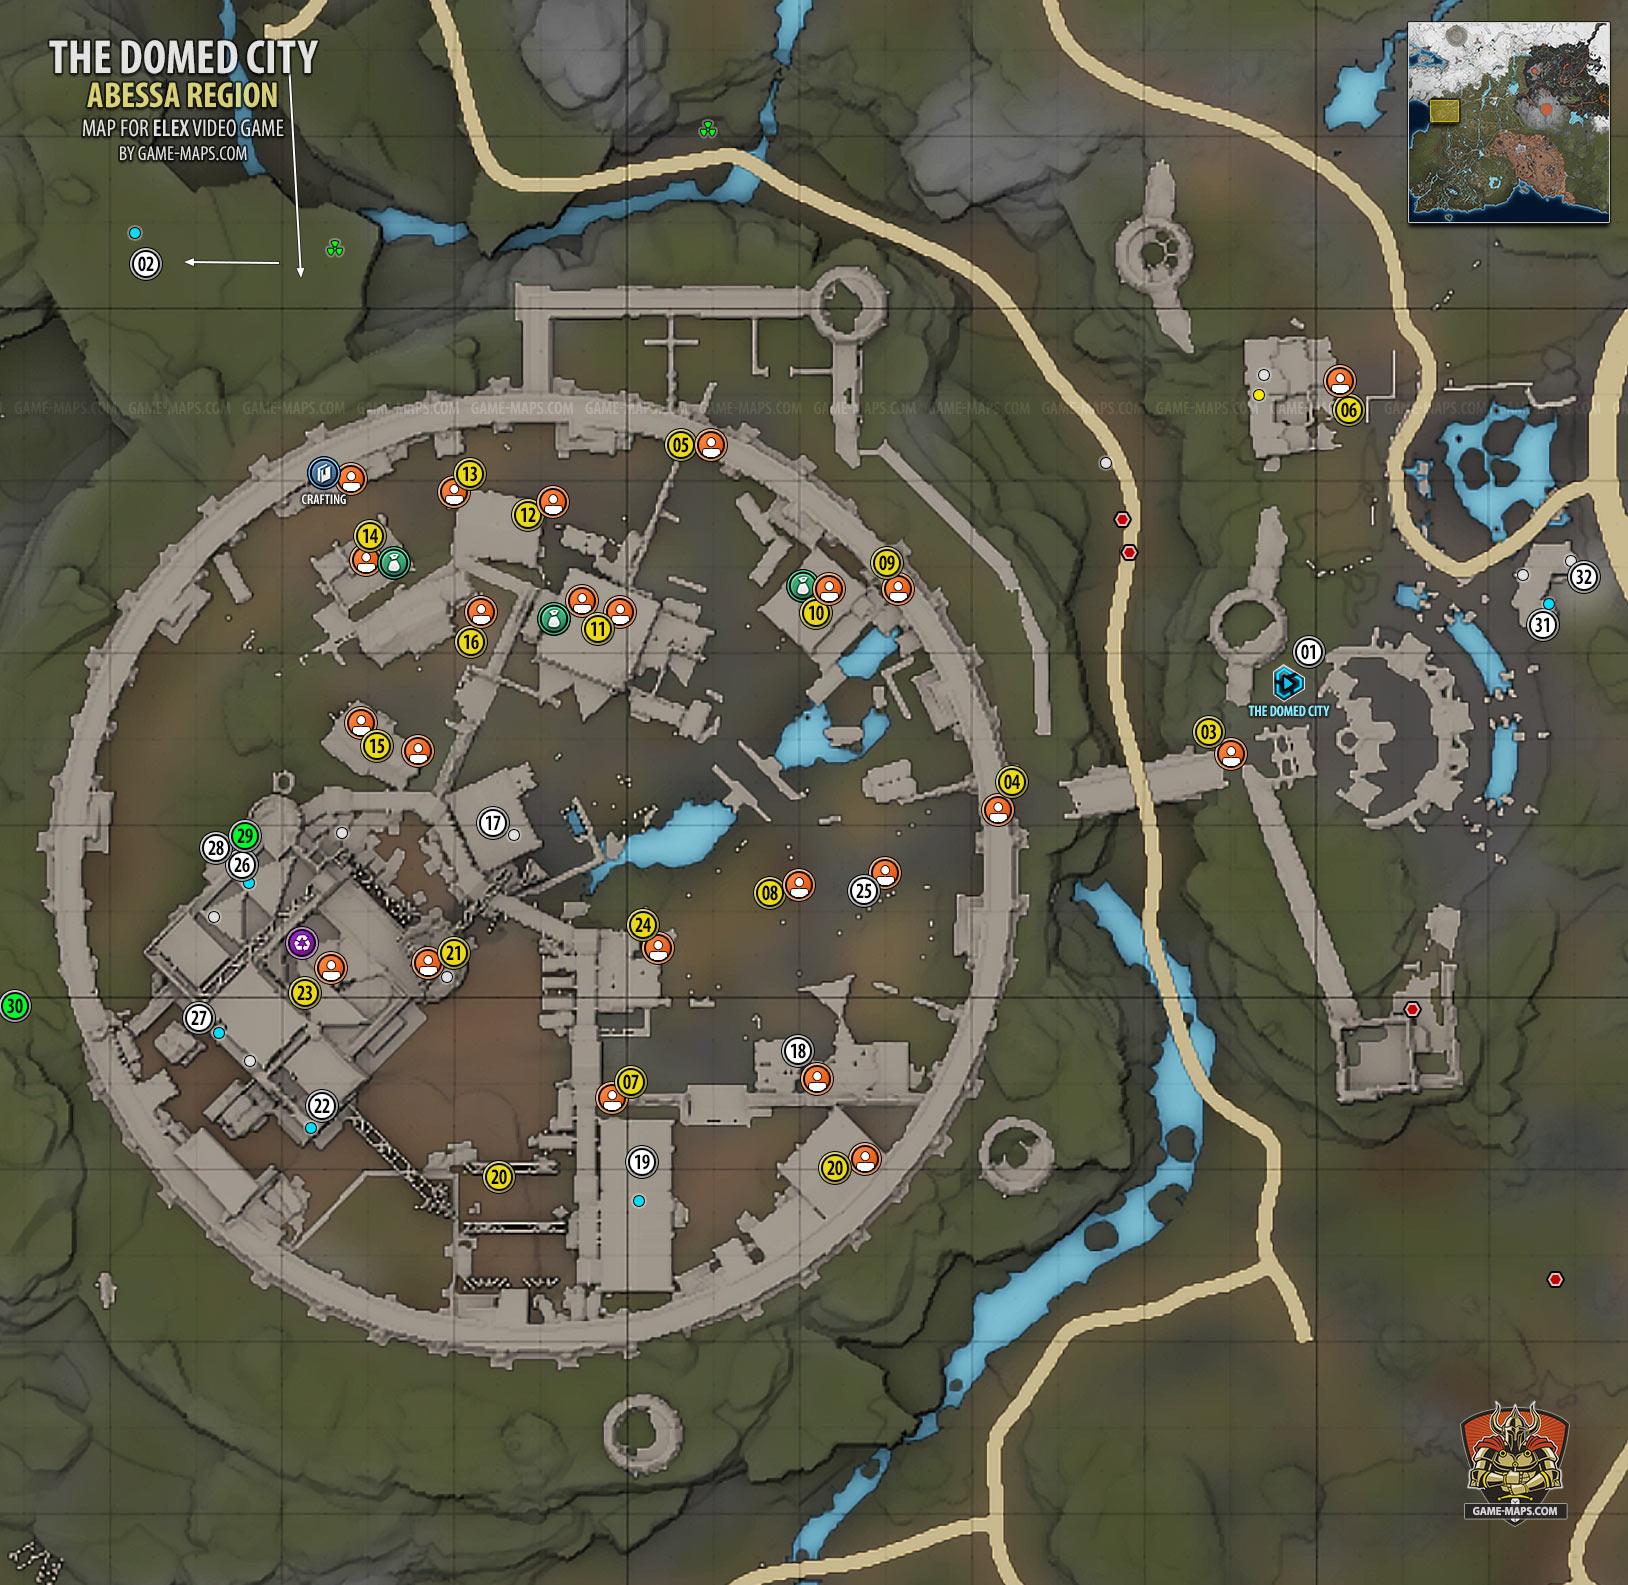 Domed City Map & Walkthrough | Abessa | ELEX | game-maps.com on city neighborhood, city intersection, city of potwin kansas, city street, city of austin etj, topographic map, city restaurants, locator map, city of arcadia fl, fantasy map, city of sandpoint idaho, city of lake village arkansas, city of audubon iowa, street map, city drawing, city of newburgh ny, city of galva il, city of oregon wisconsin, road atlas, city of alexandria louisiana, reversed map, world map, city planning, pictorial maps, city of hamilton michigan, city diagram, city of milan ga, city road, thematic map,